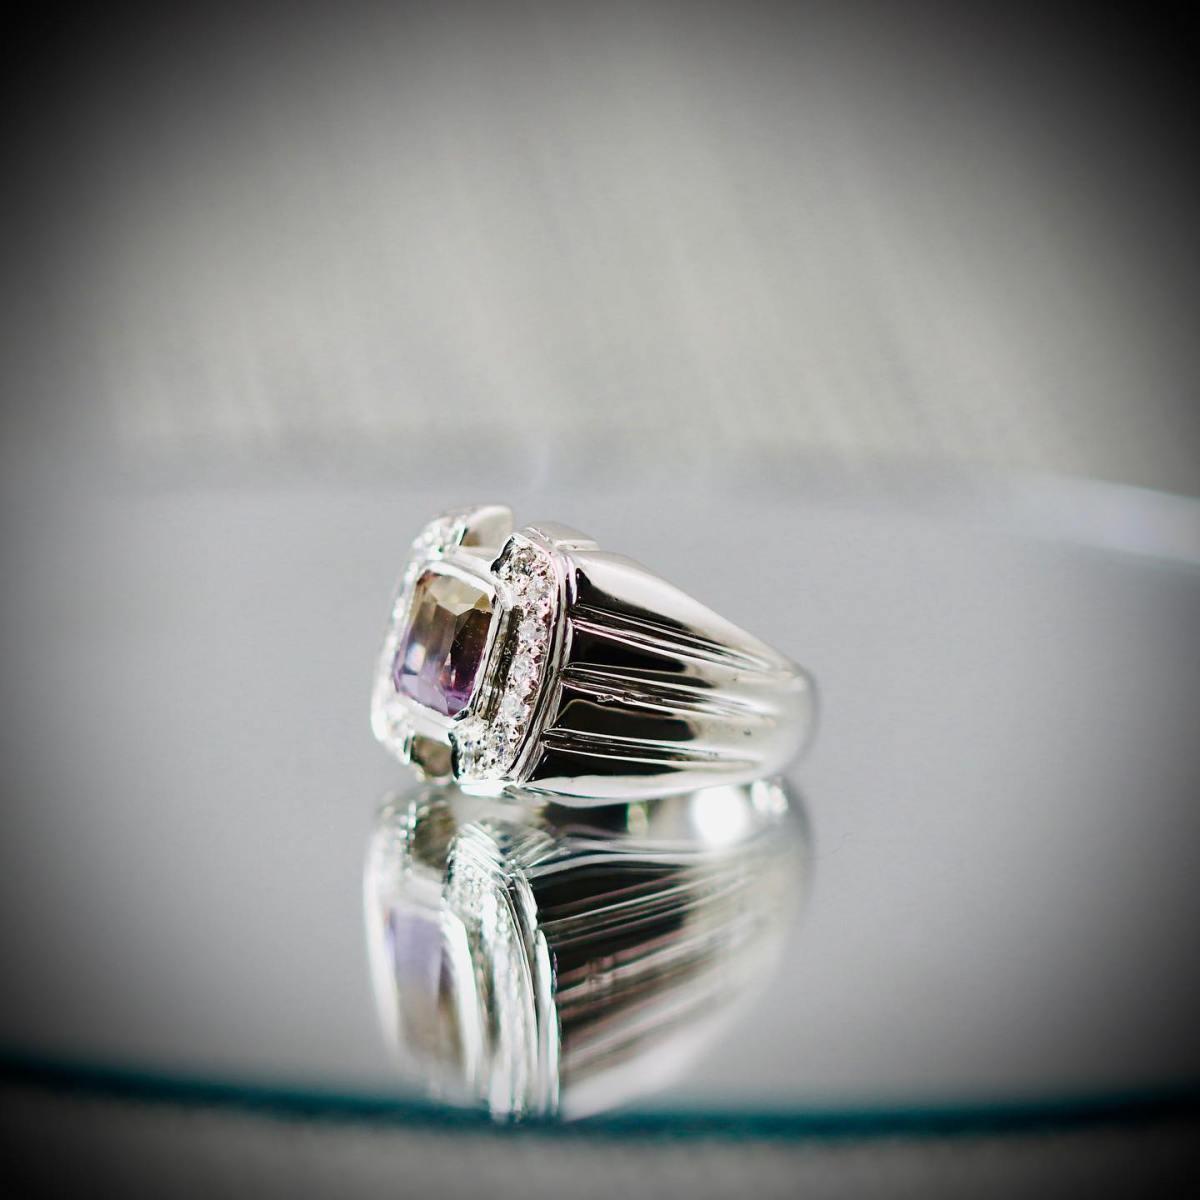 Buy Natural Gemstone & Silver 925 Rings Jewelry online in pakistan